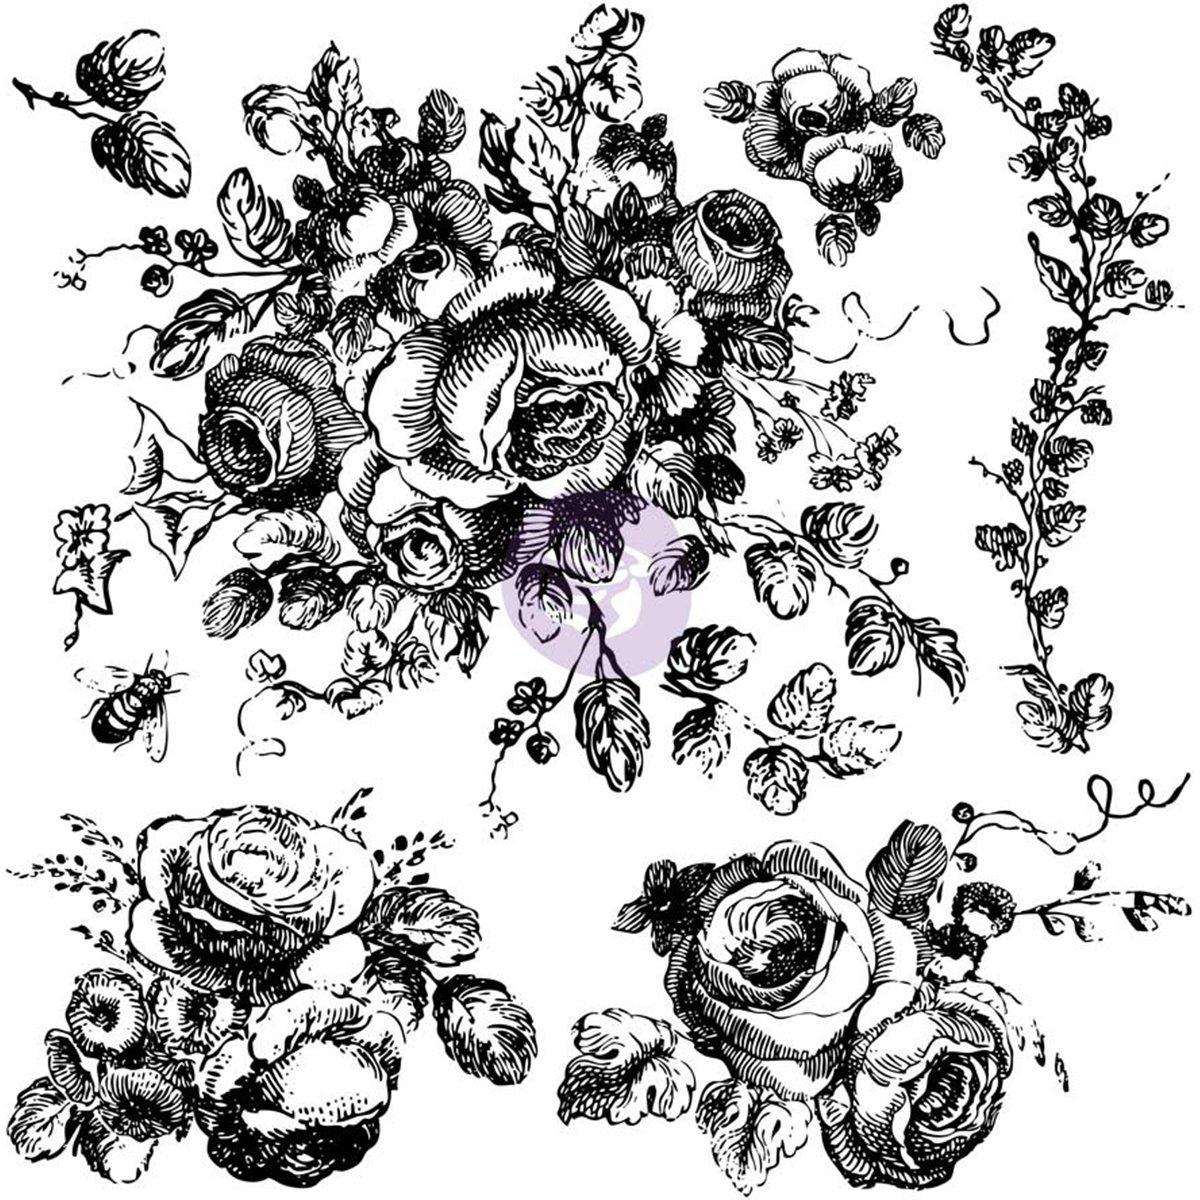 Prima Marketing IOD Decor Stamps - Floral by Prima Marketing (Image #2)